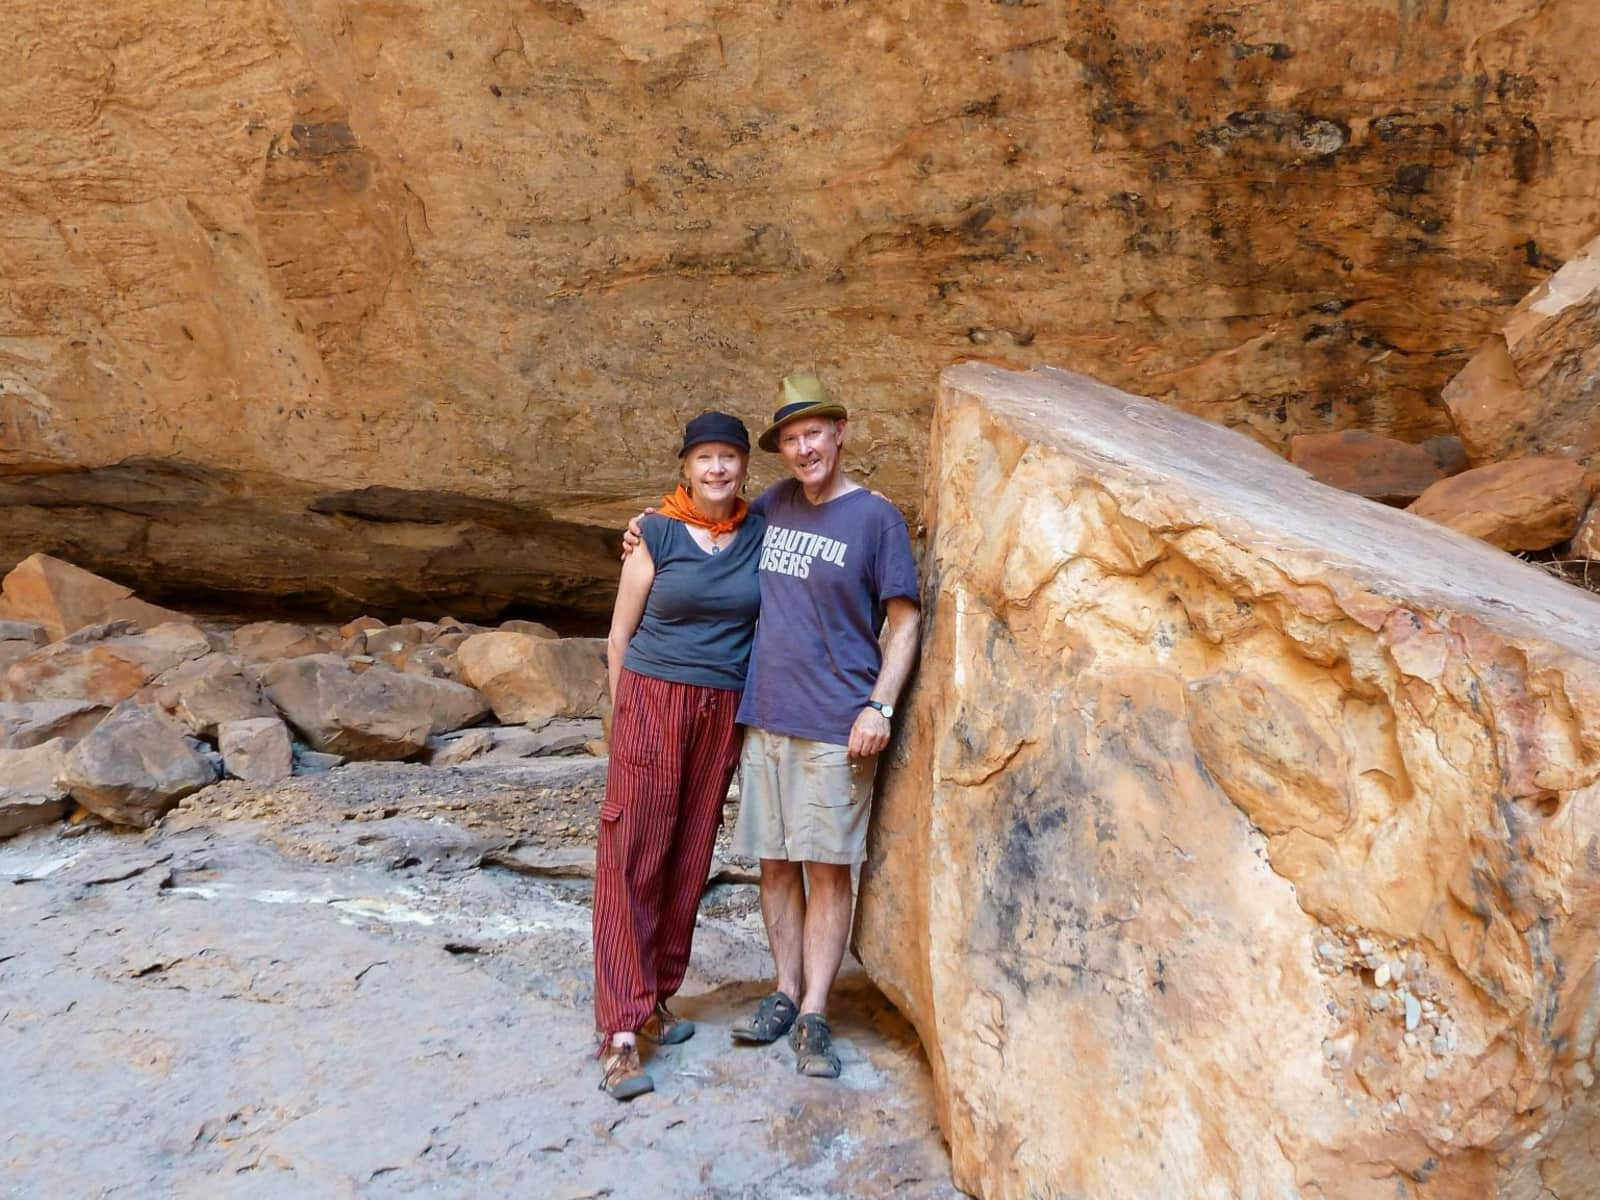 Donna & David from Perth, Western Australia, Australia